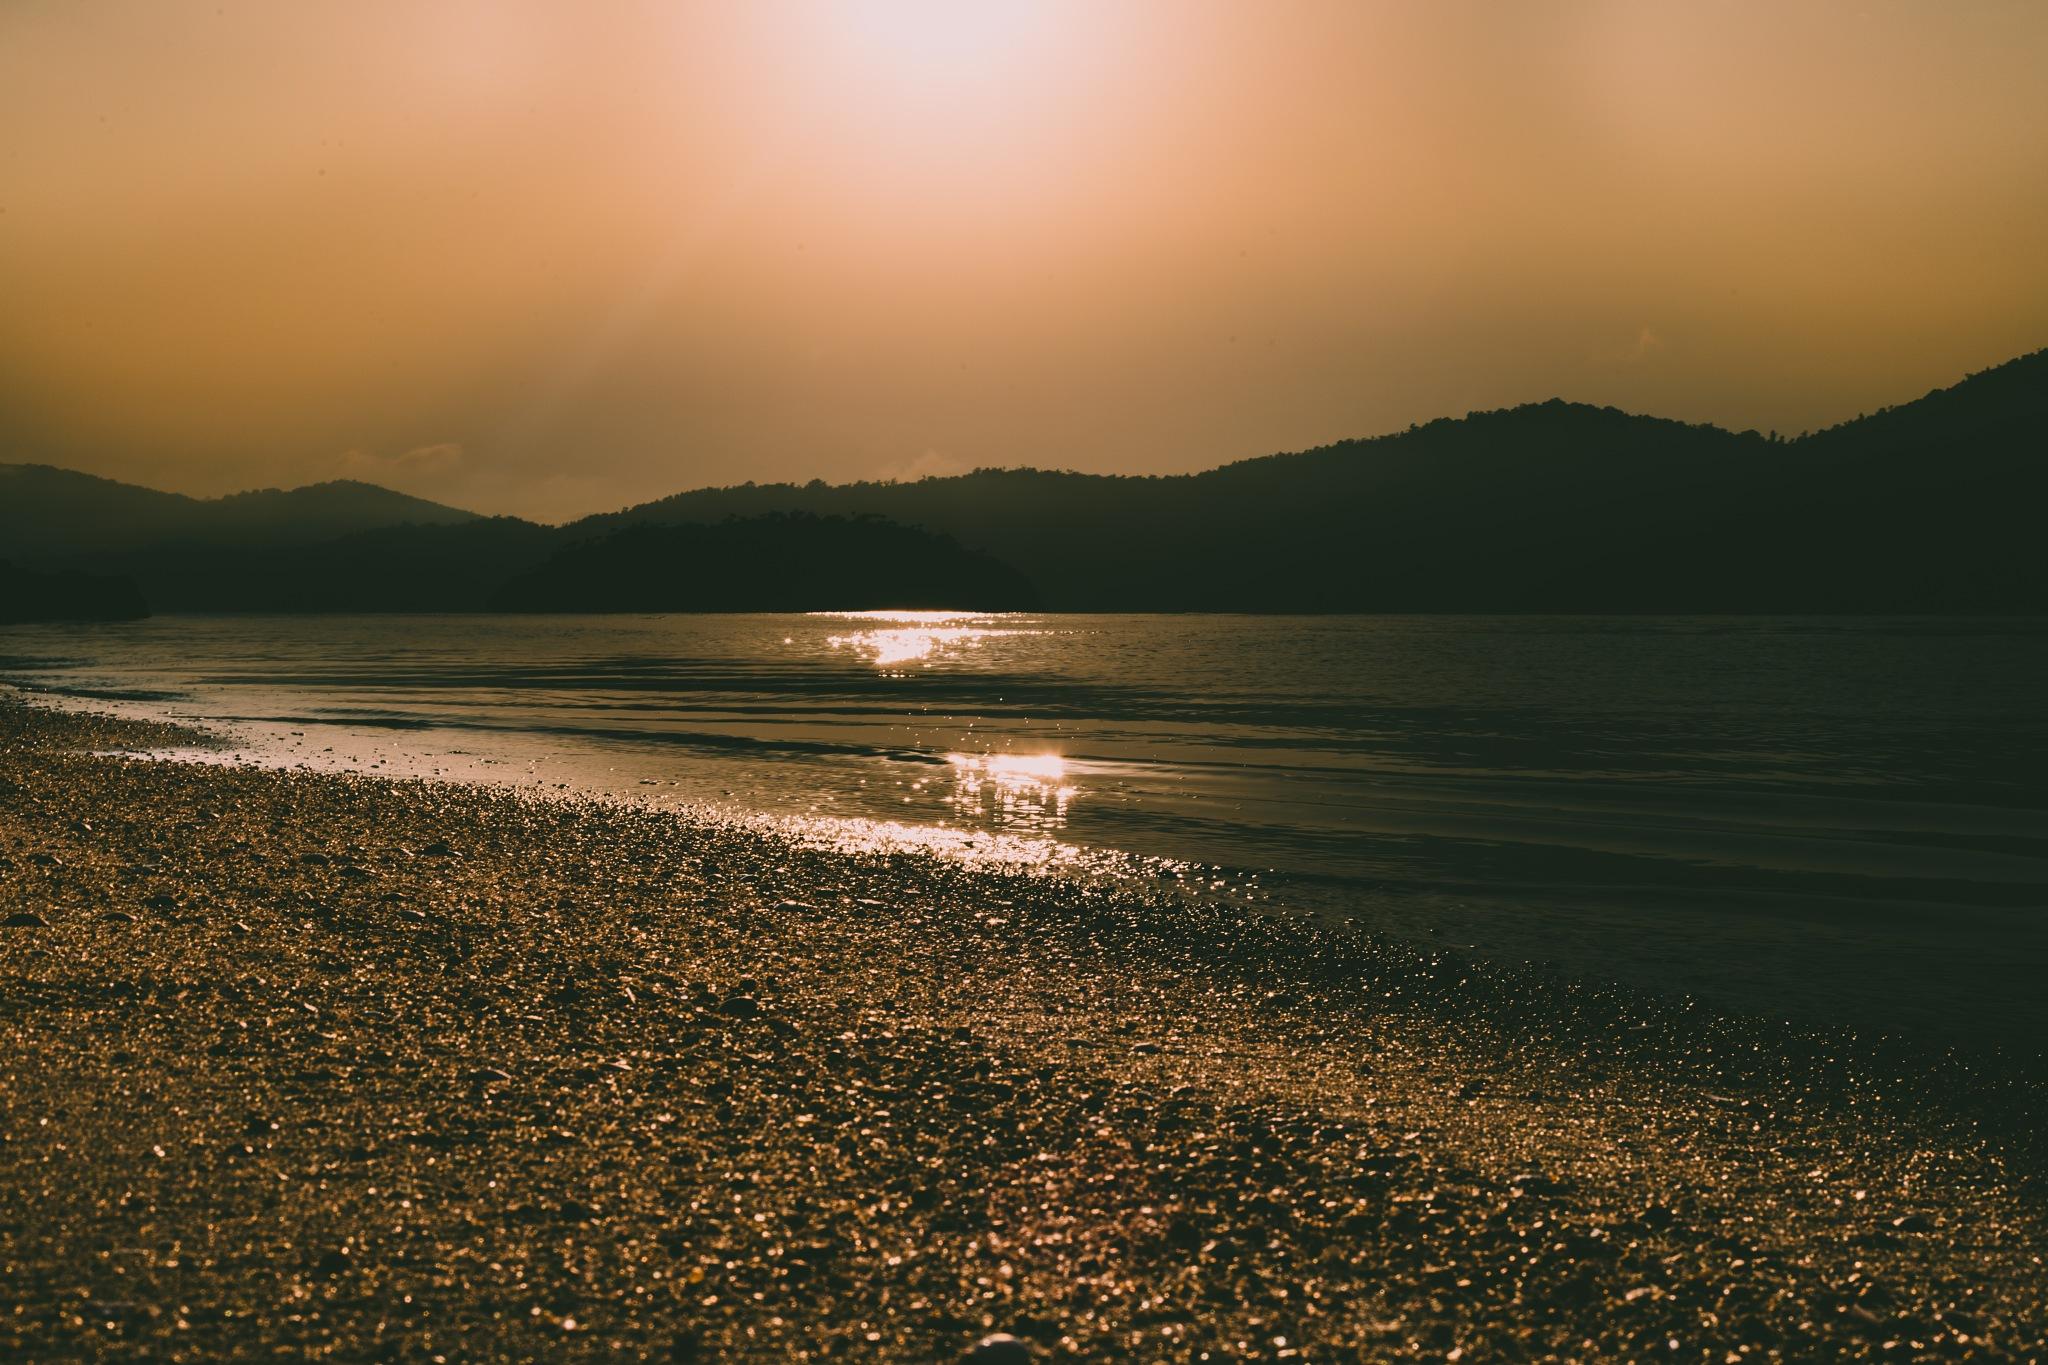 Sun by Erick Ferreira